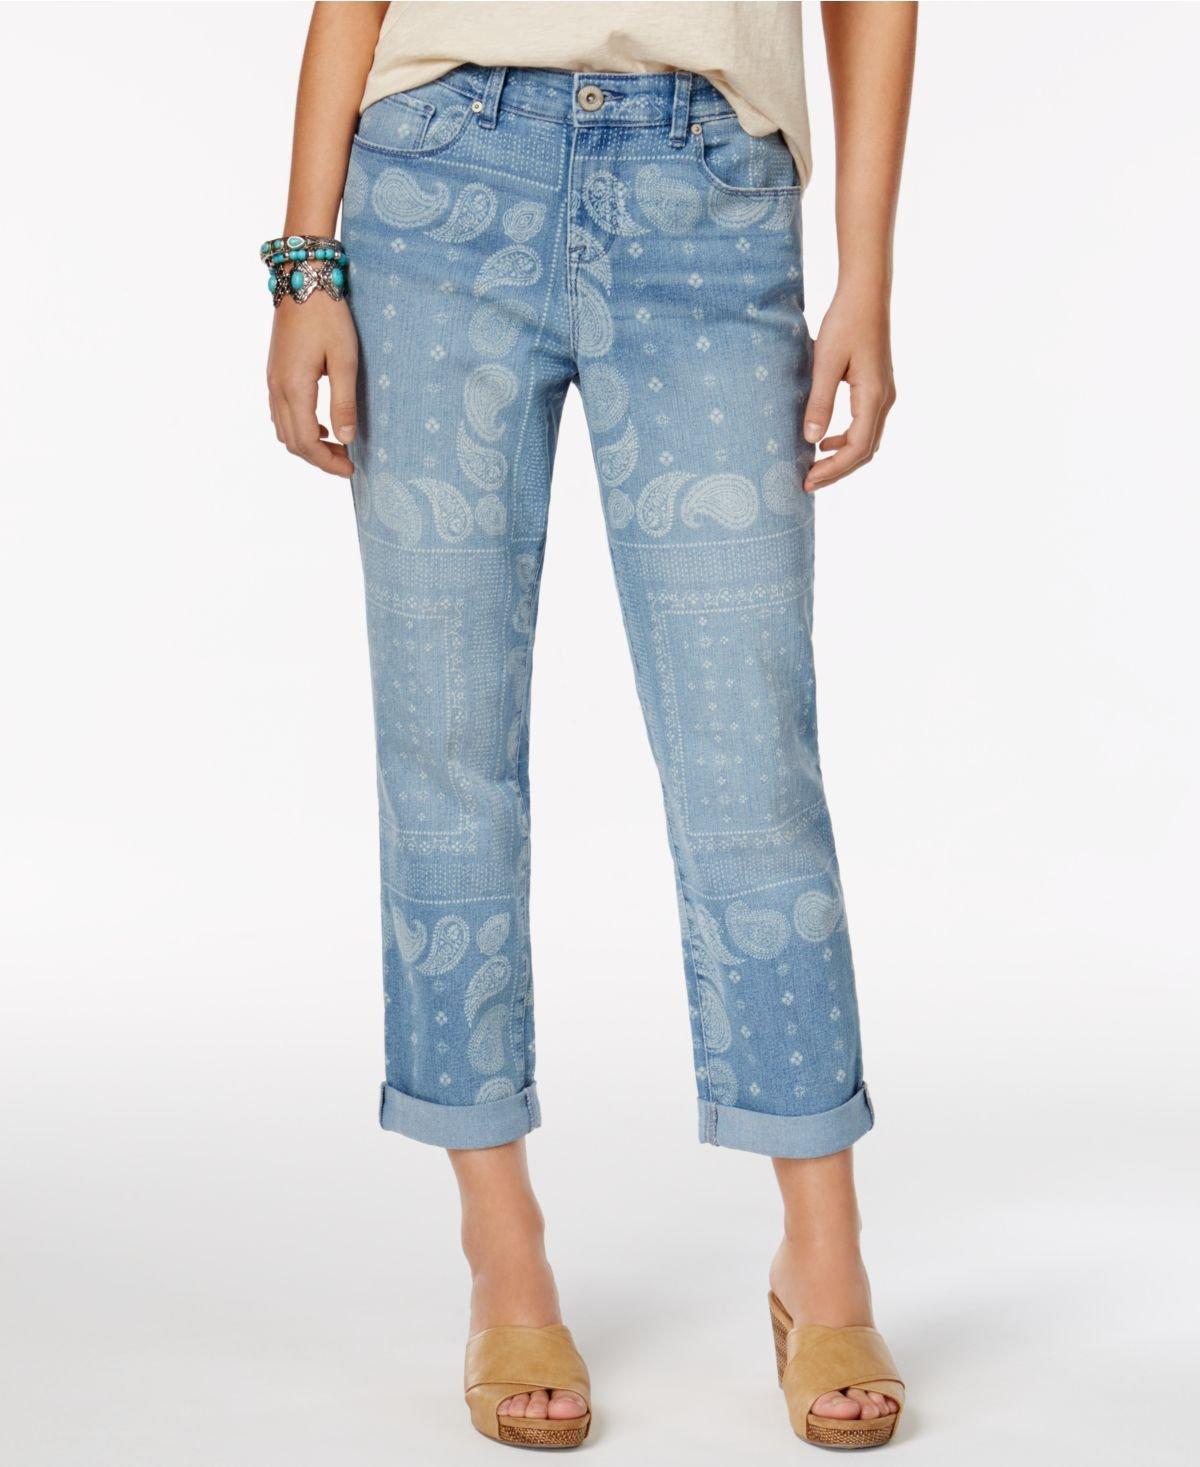 Style & Co. Womens Plus Denim Printed Boyfriend Jeans Blue 12